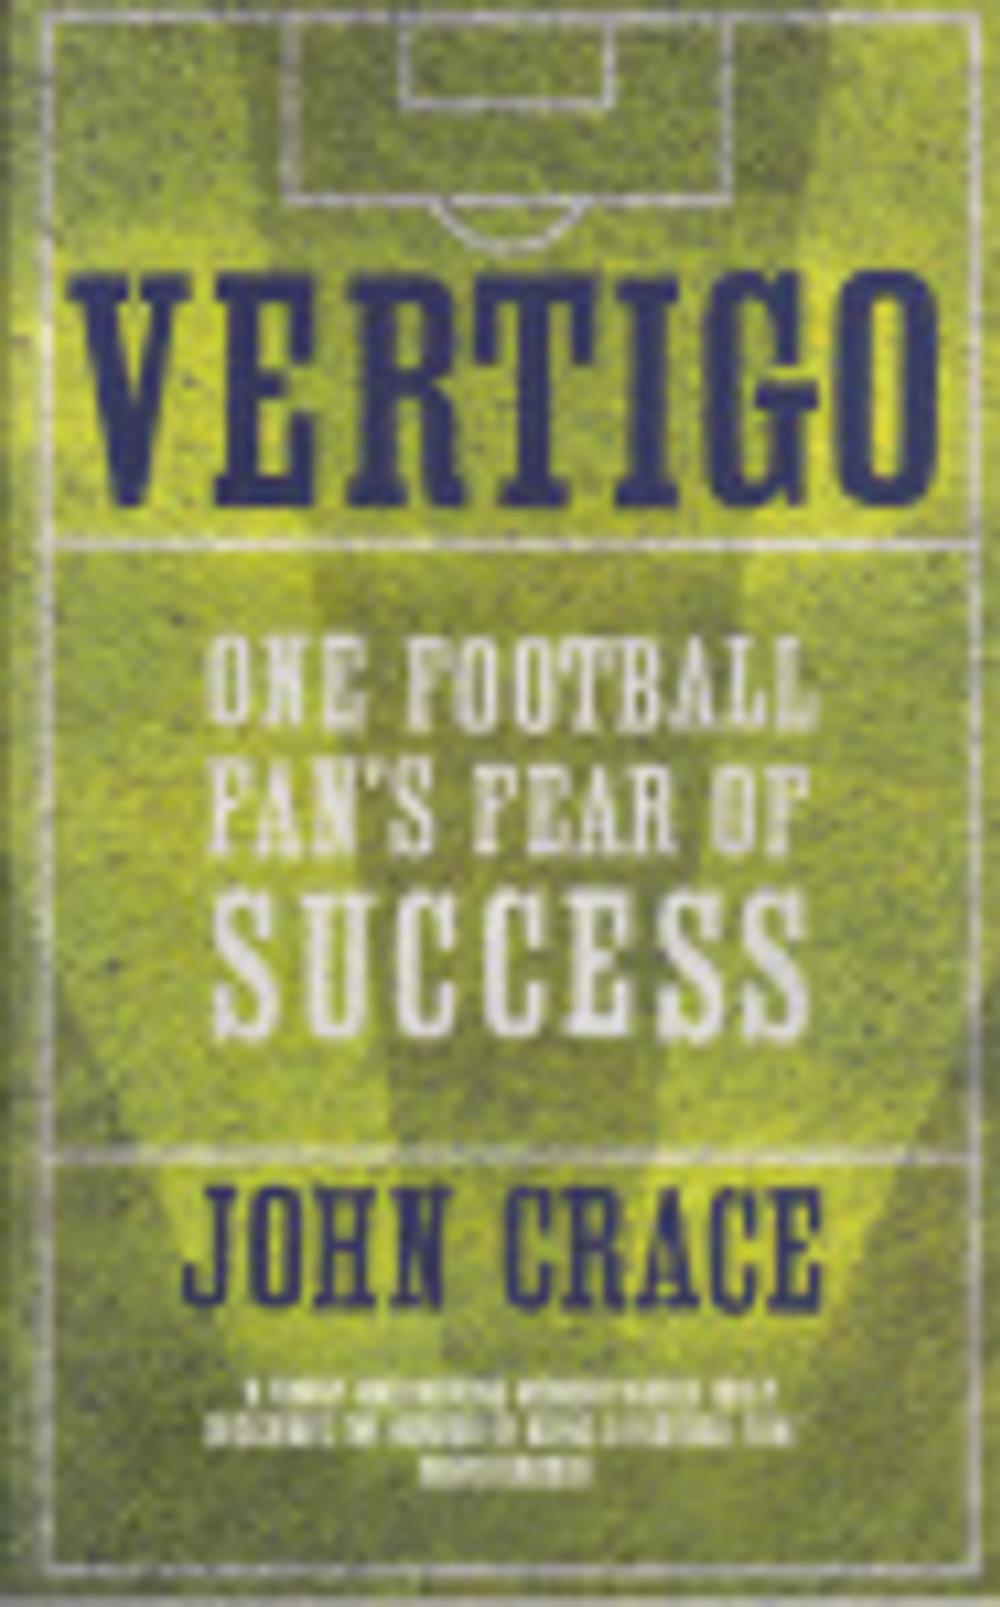 Cover of Vertigo by John Crace